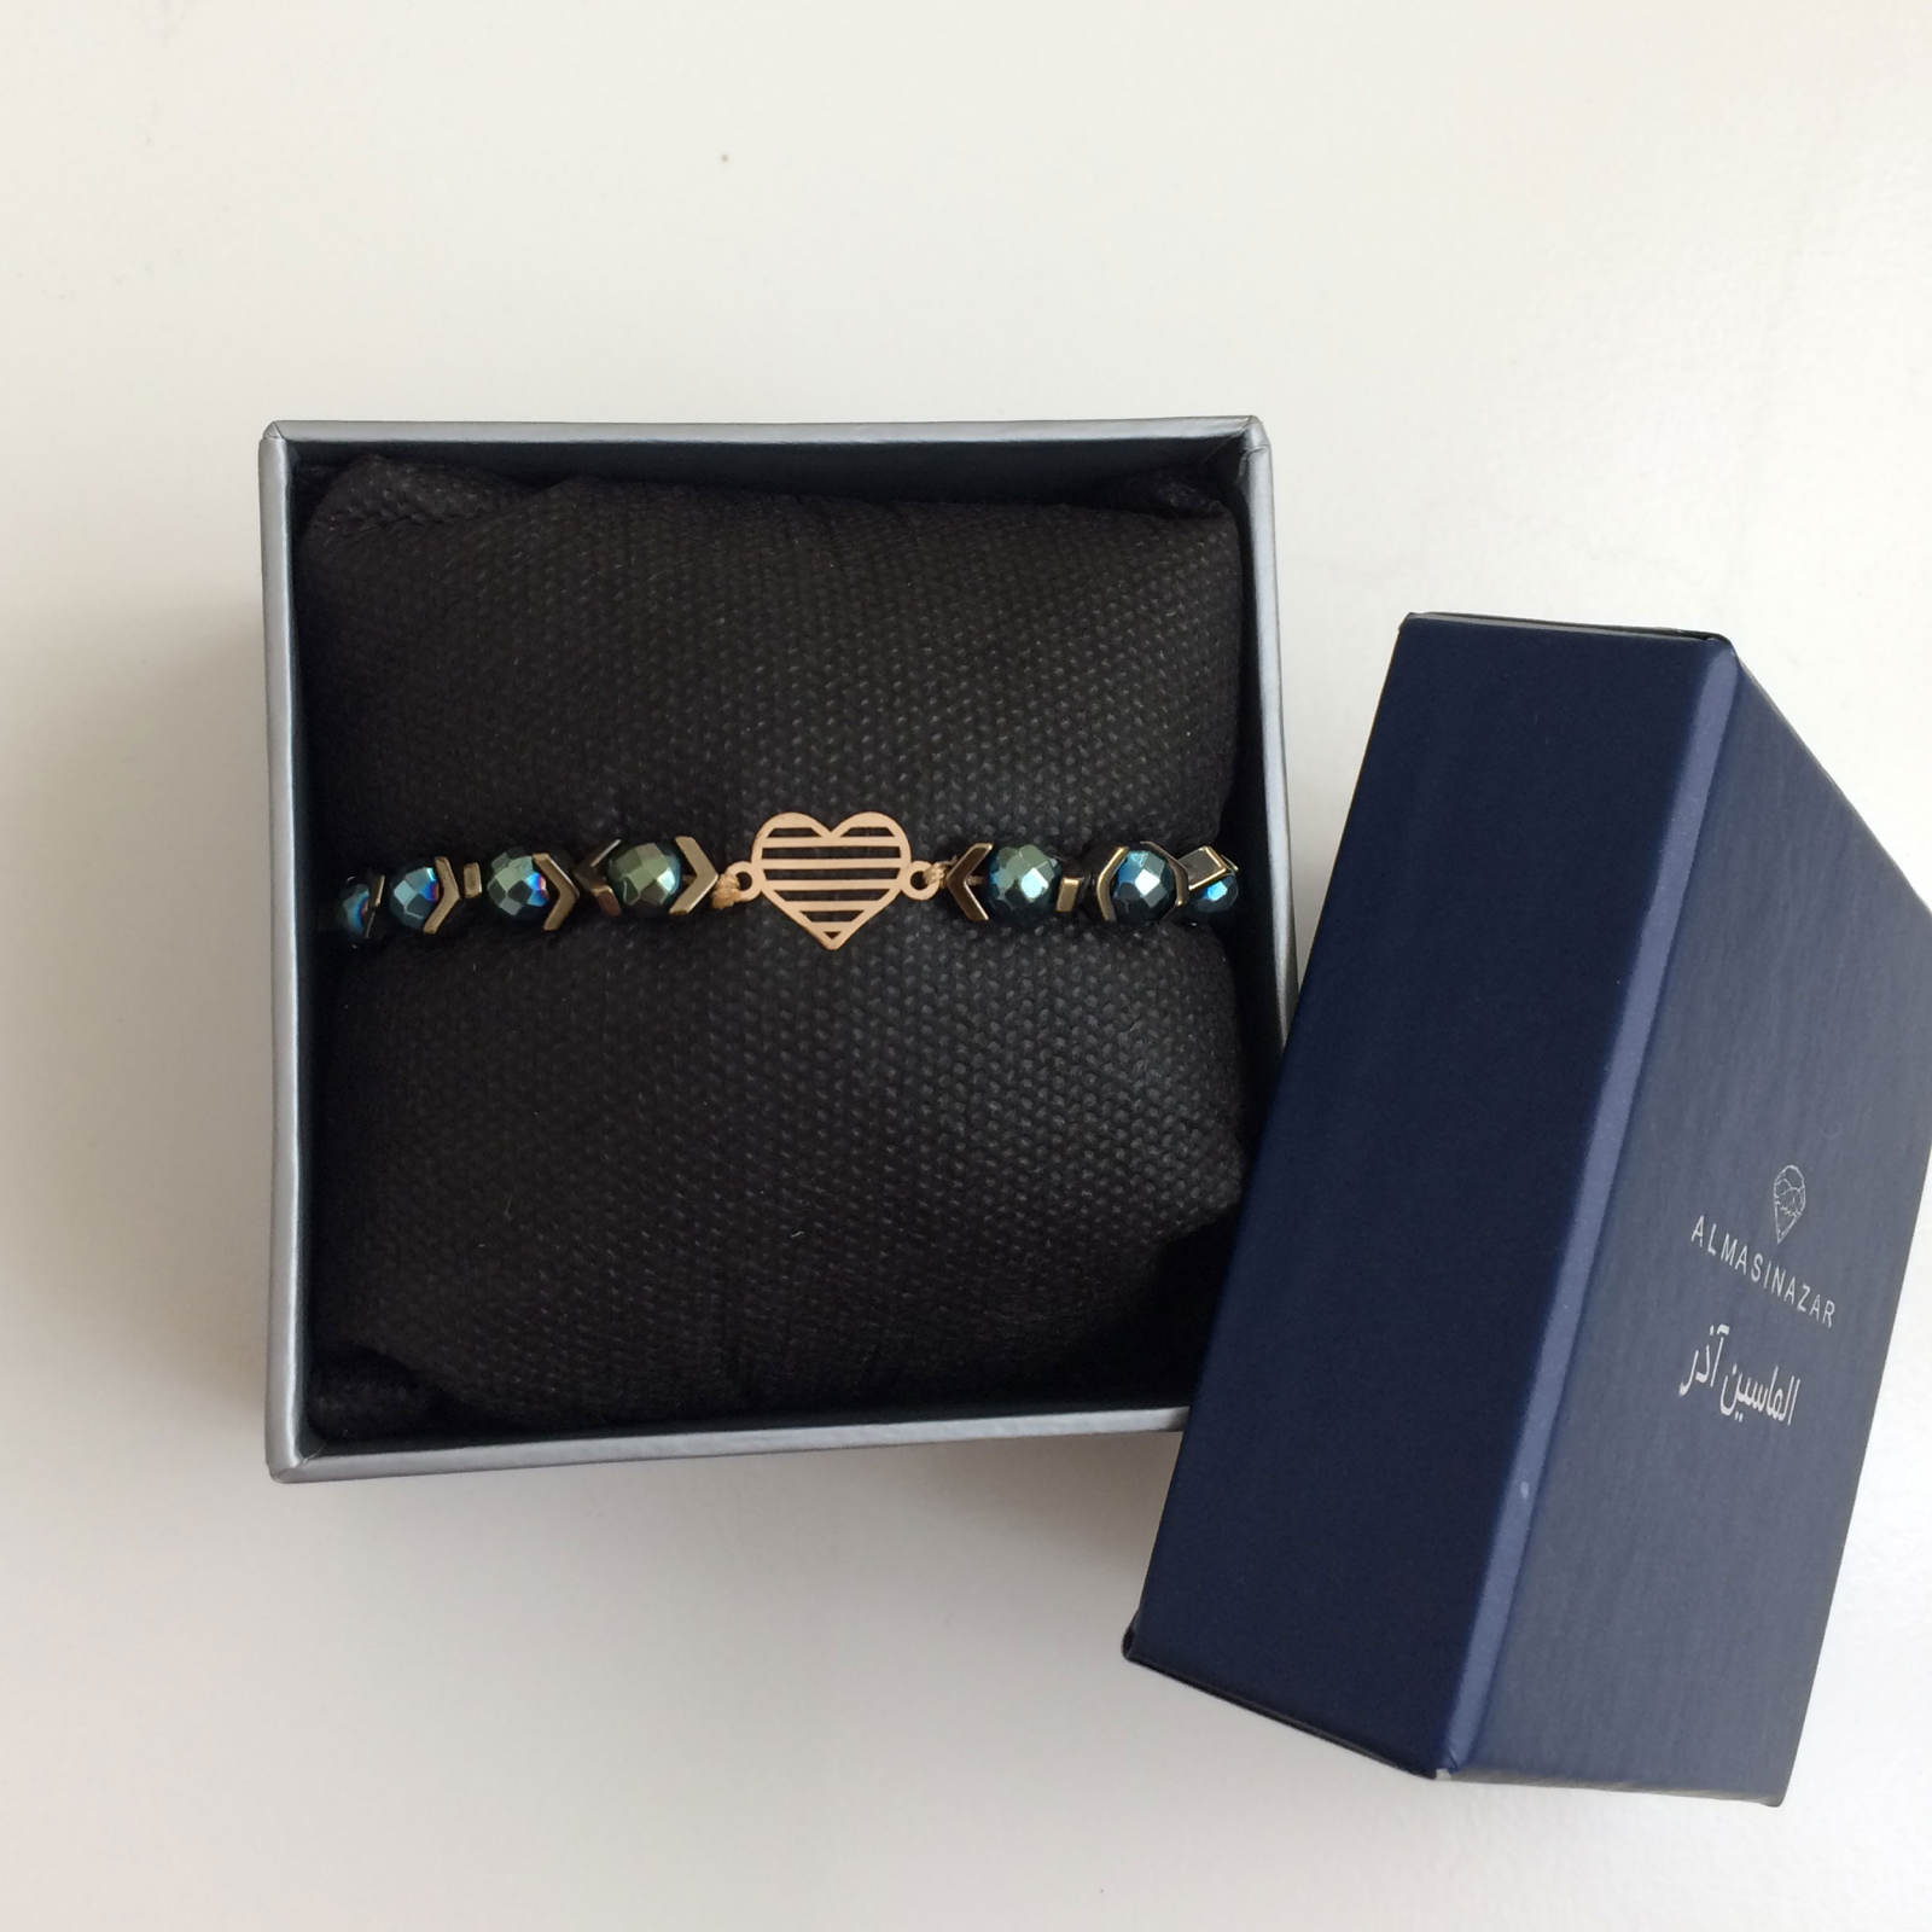 دستبند طلا 18 عیار زنانه الماسین آذر کد GHALB02 -  - 4